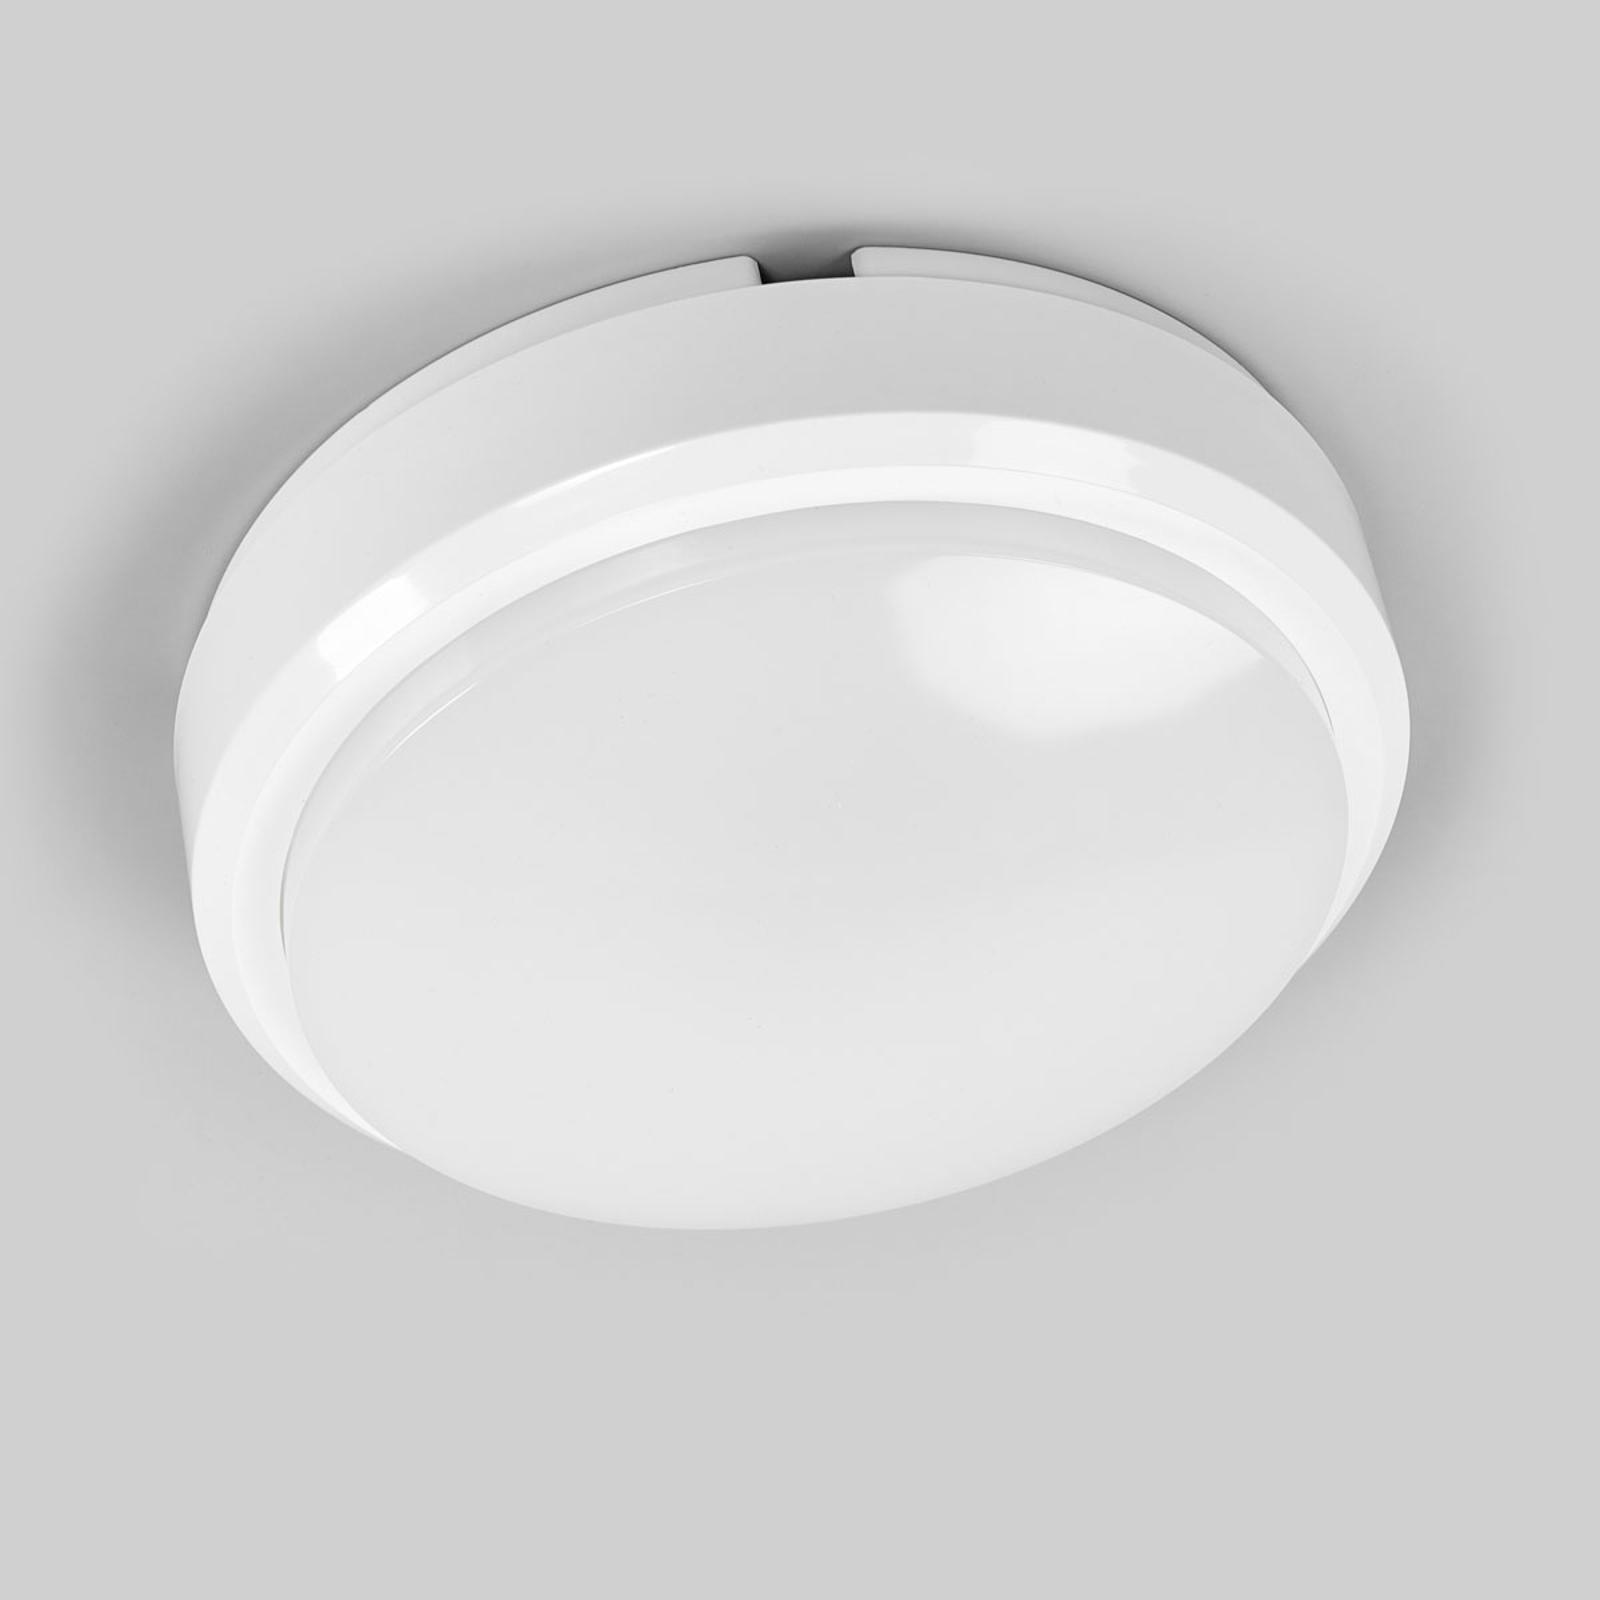 Runde LED-Deckenleuchte Bulkhead mit Sensor